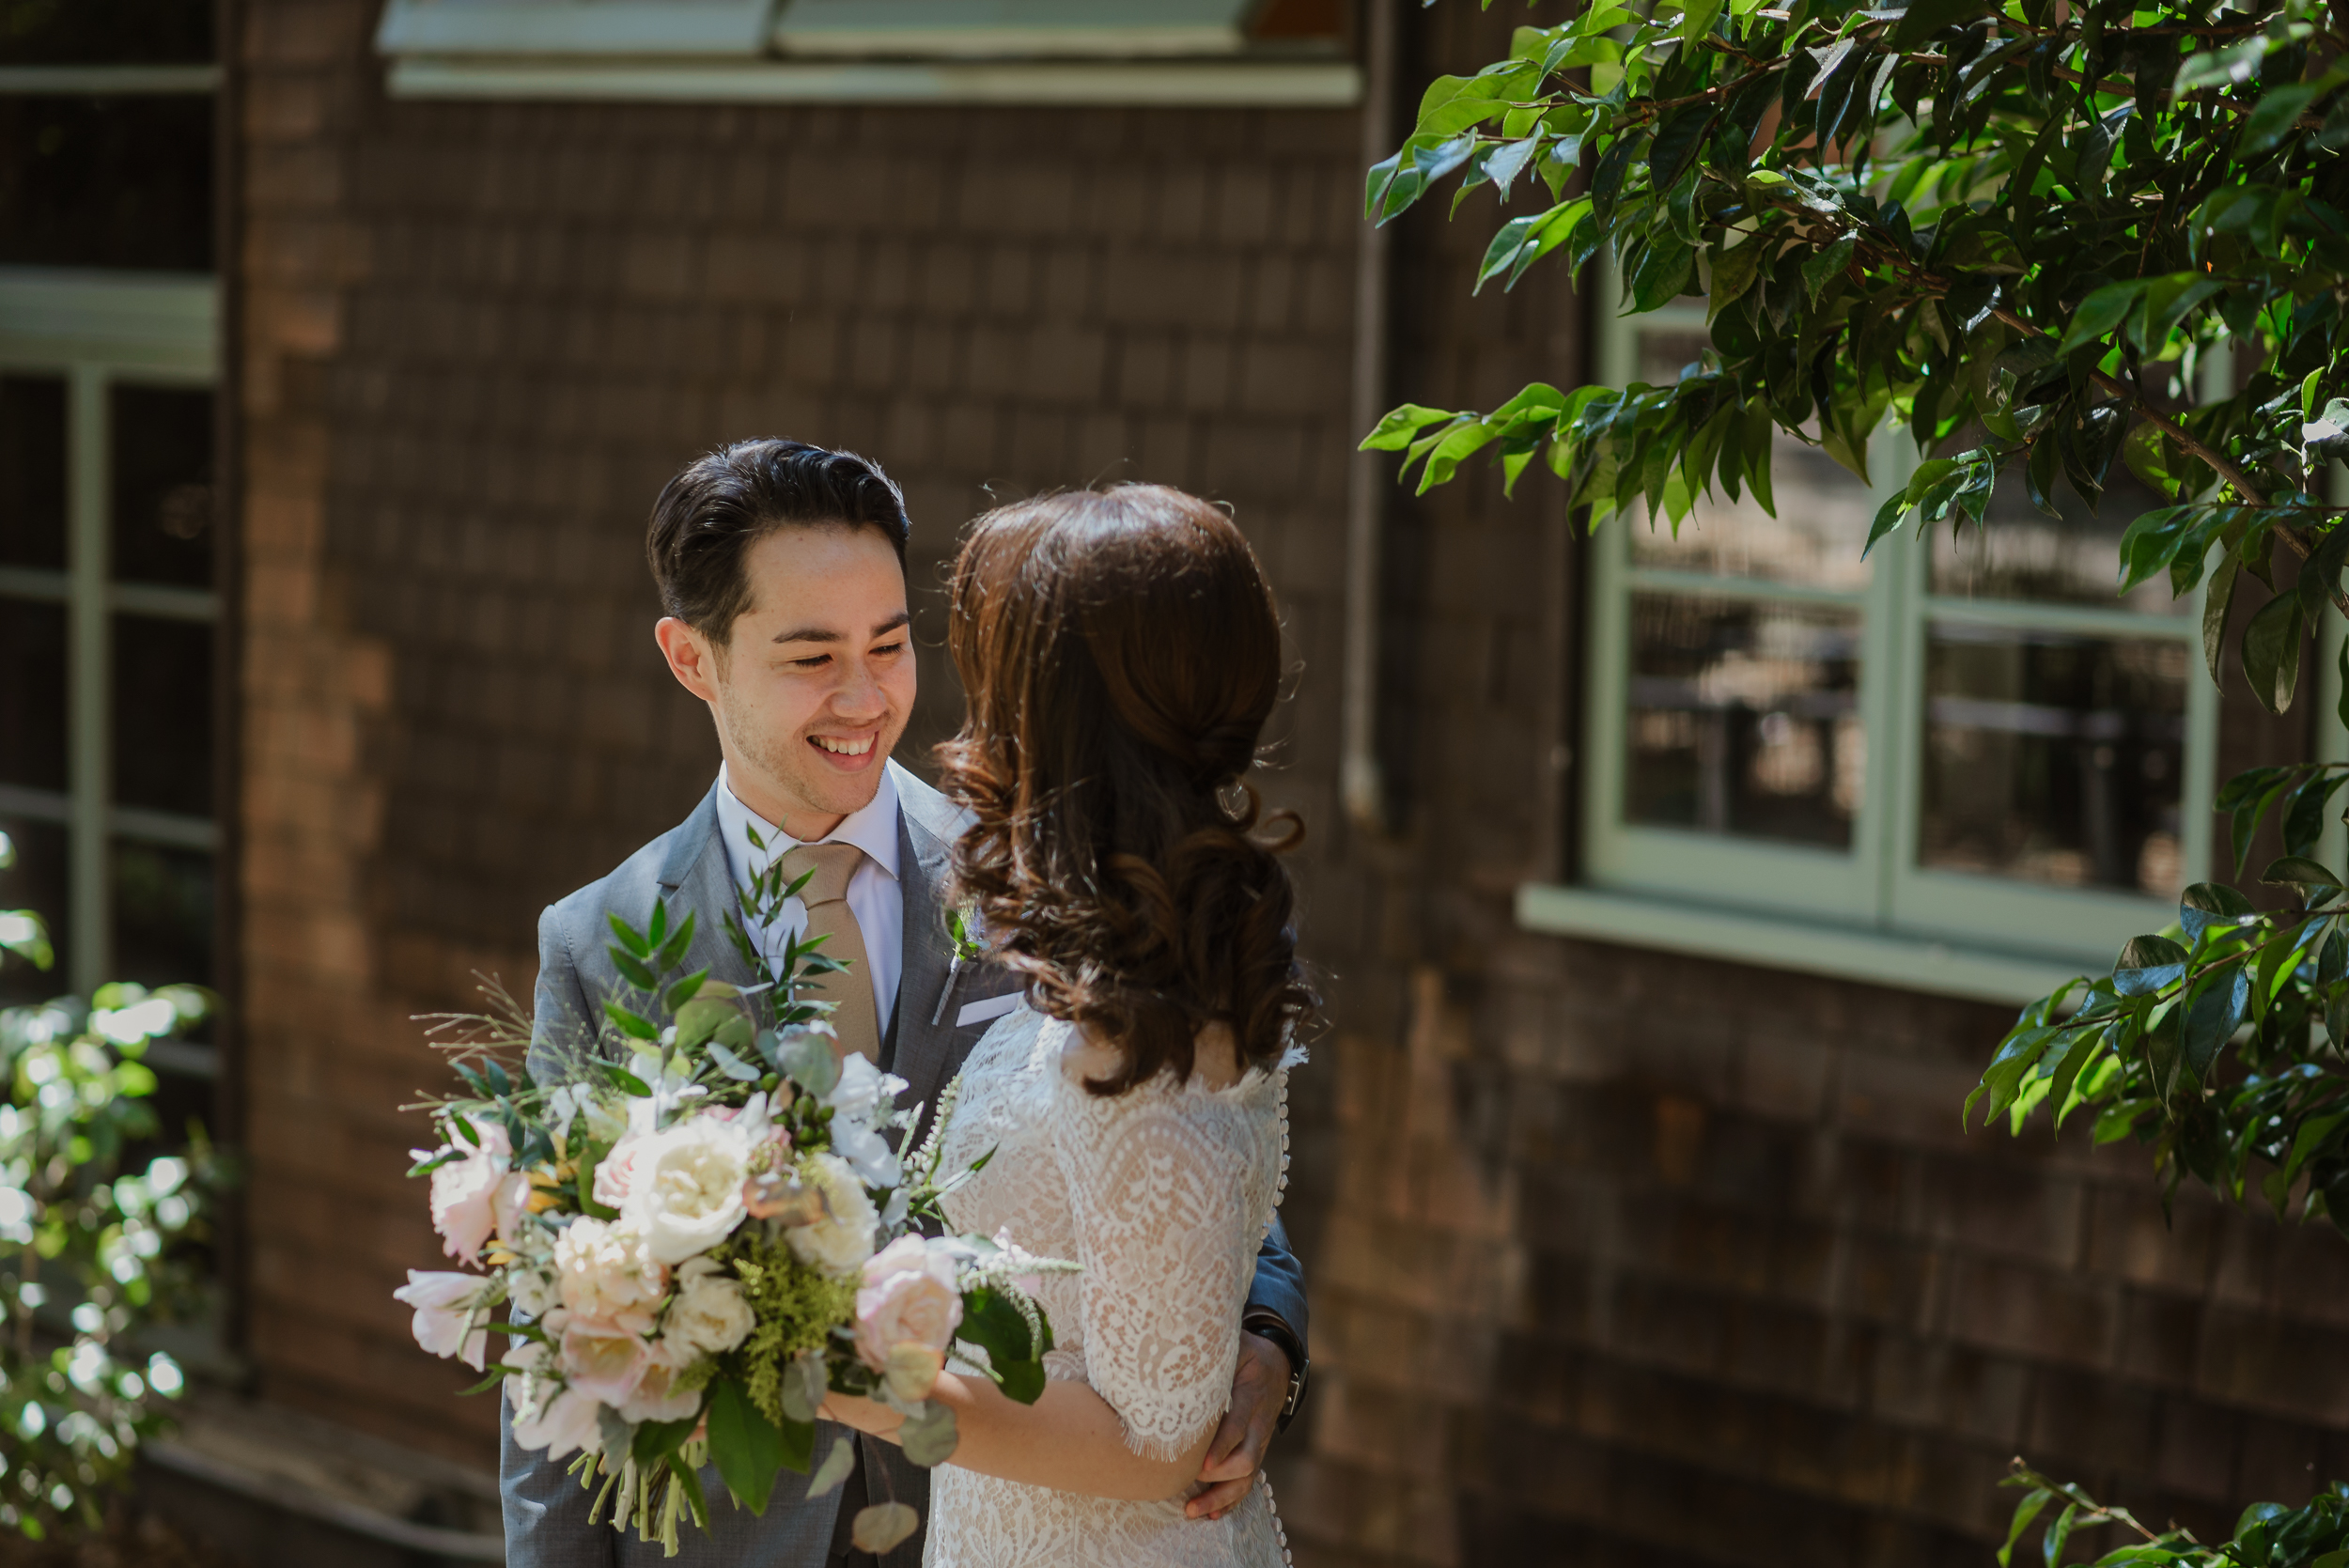 10-berkeley-uc-faculty-club-wedding-kb-vivianchen-079.jpg